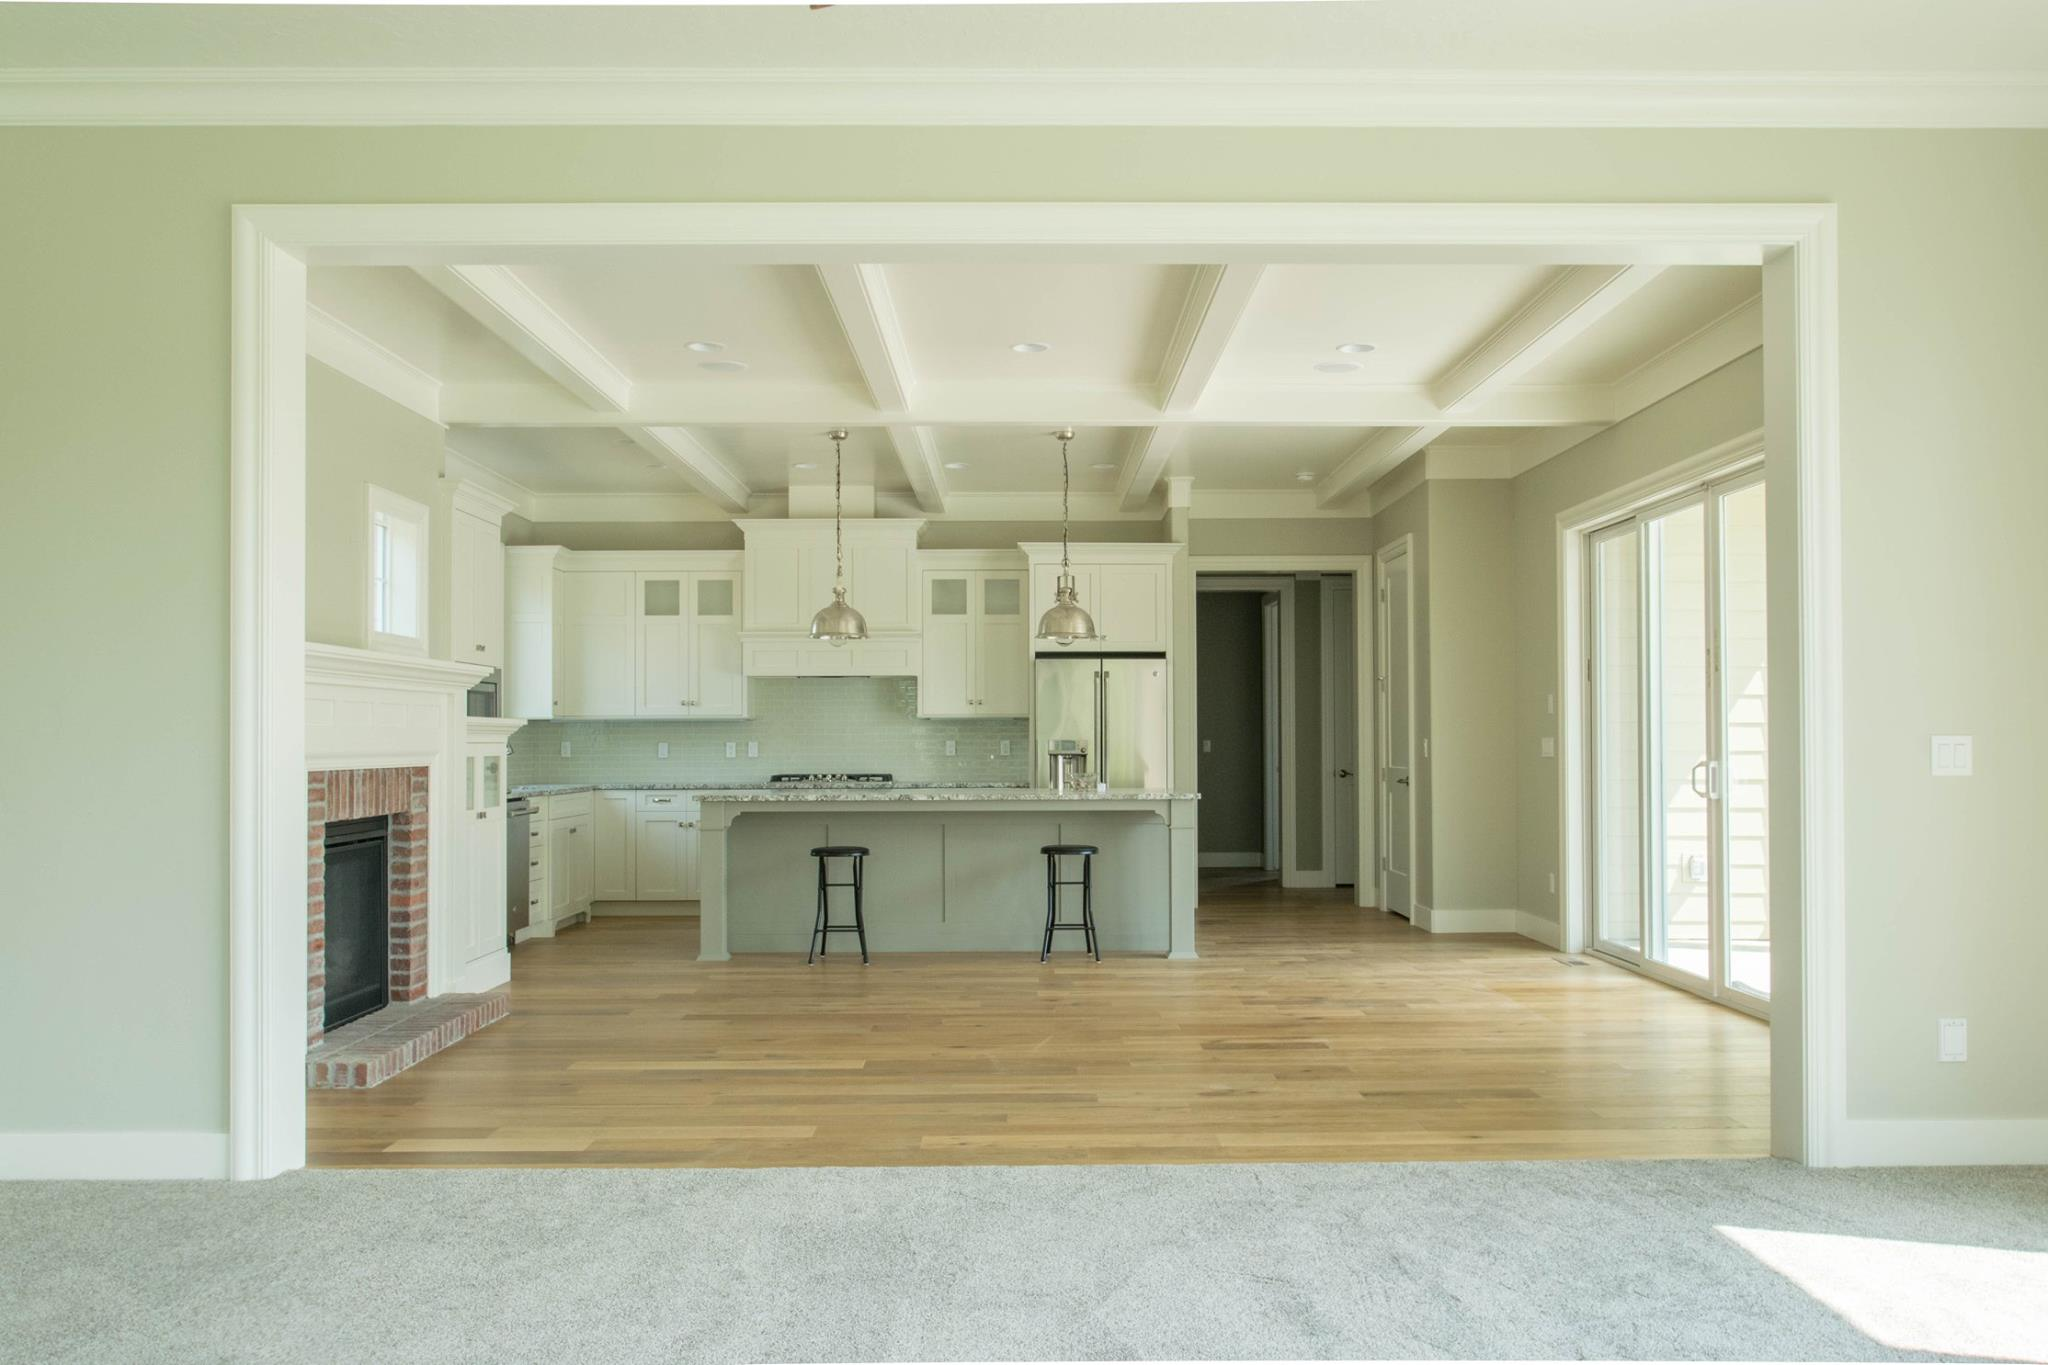 kitchen remodel timeline: should i paint before installing new cabinets?